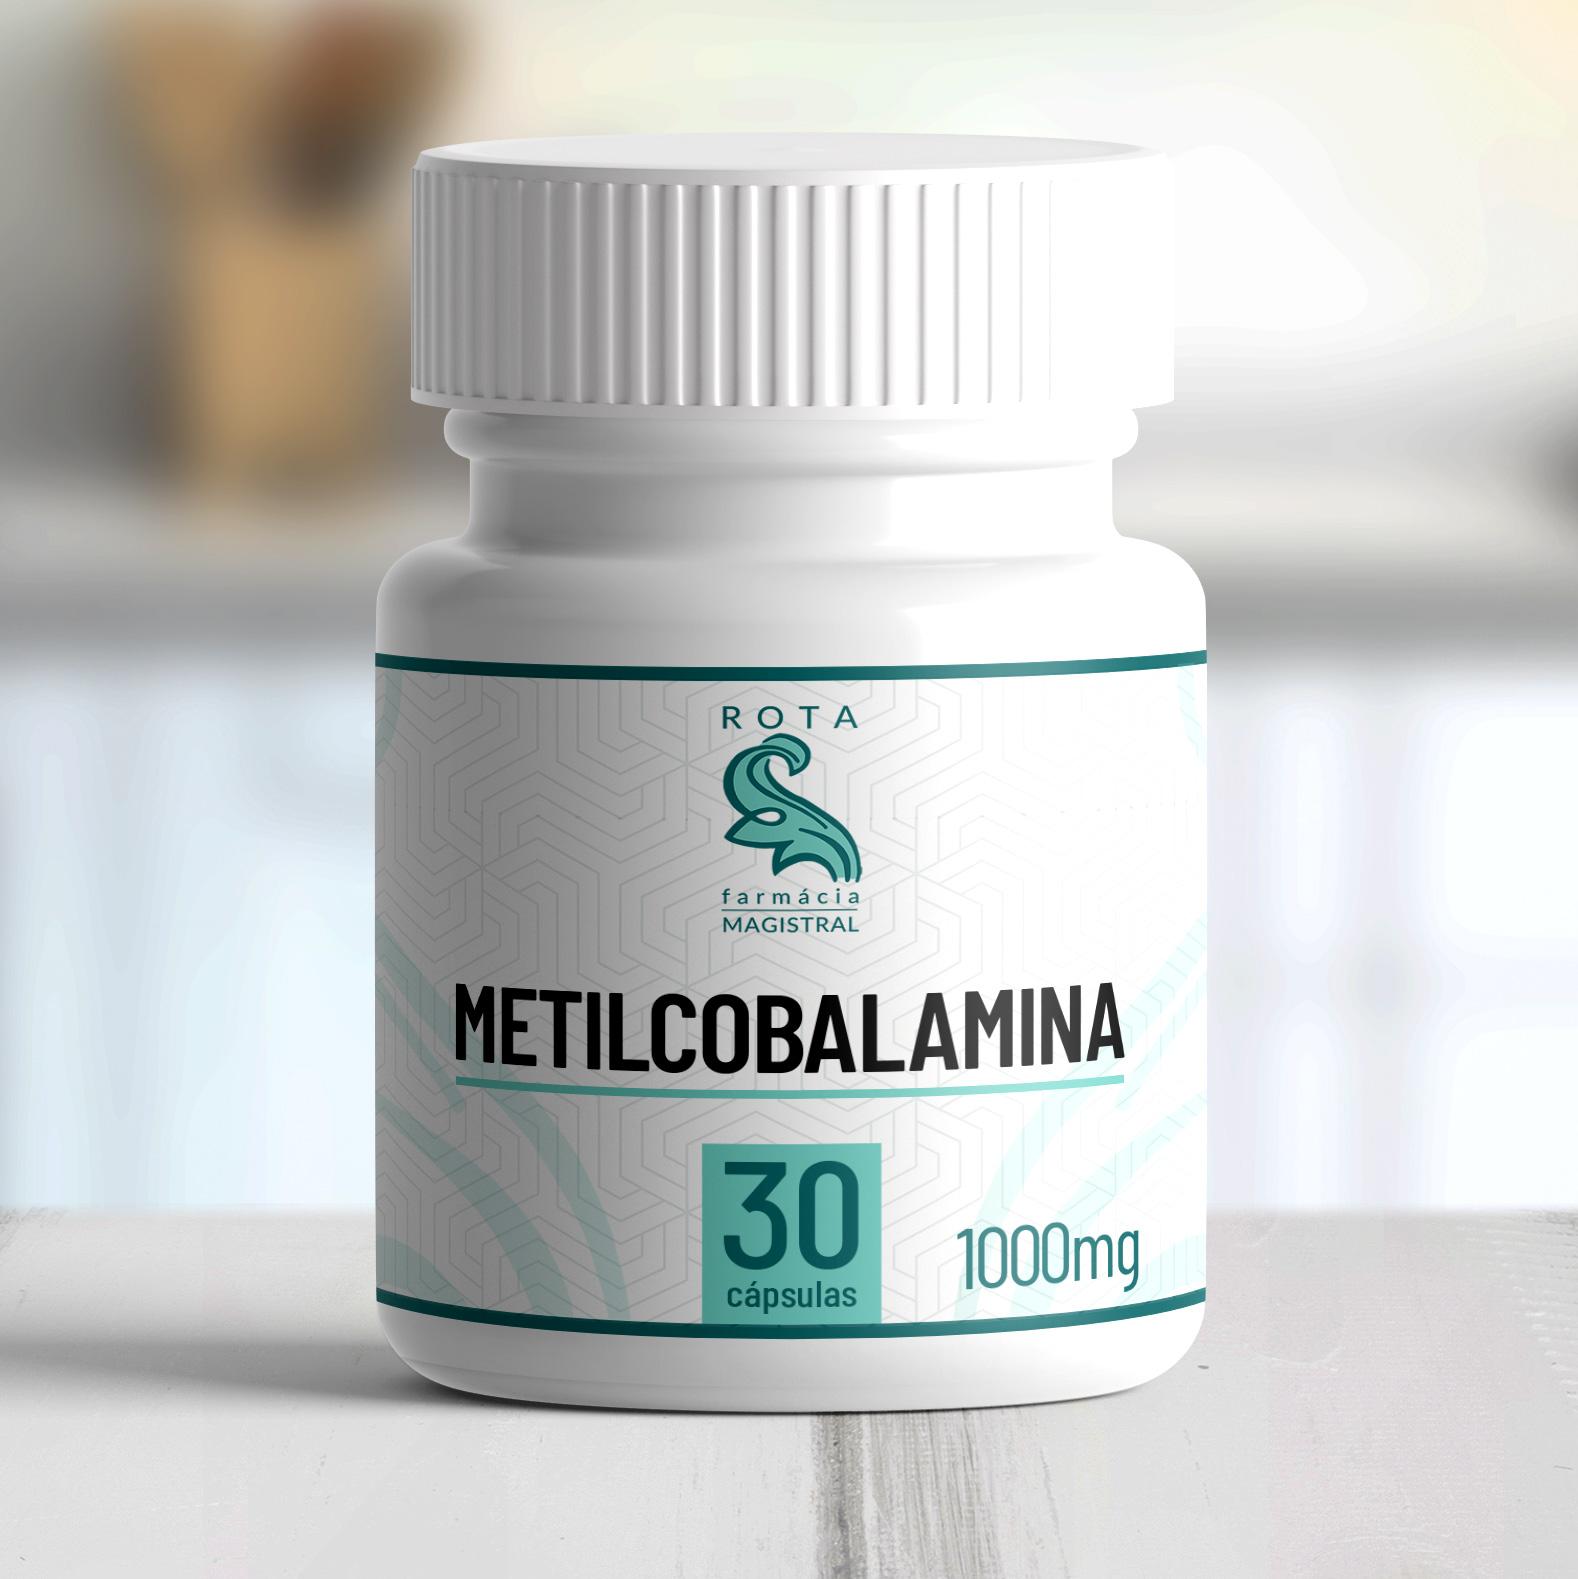 Metilcobalamina 1000mcg 30 cápsulas